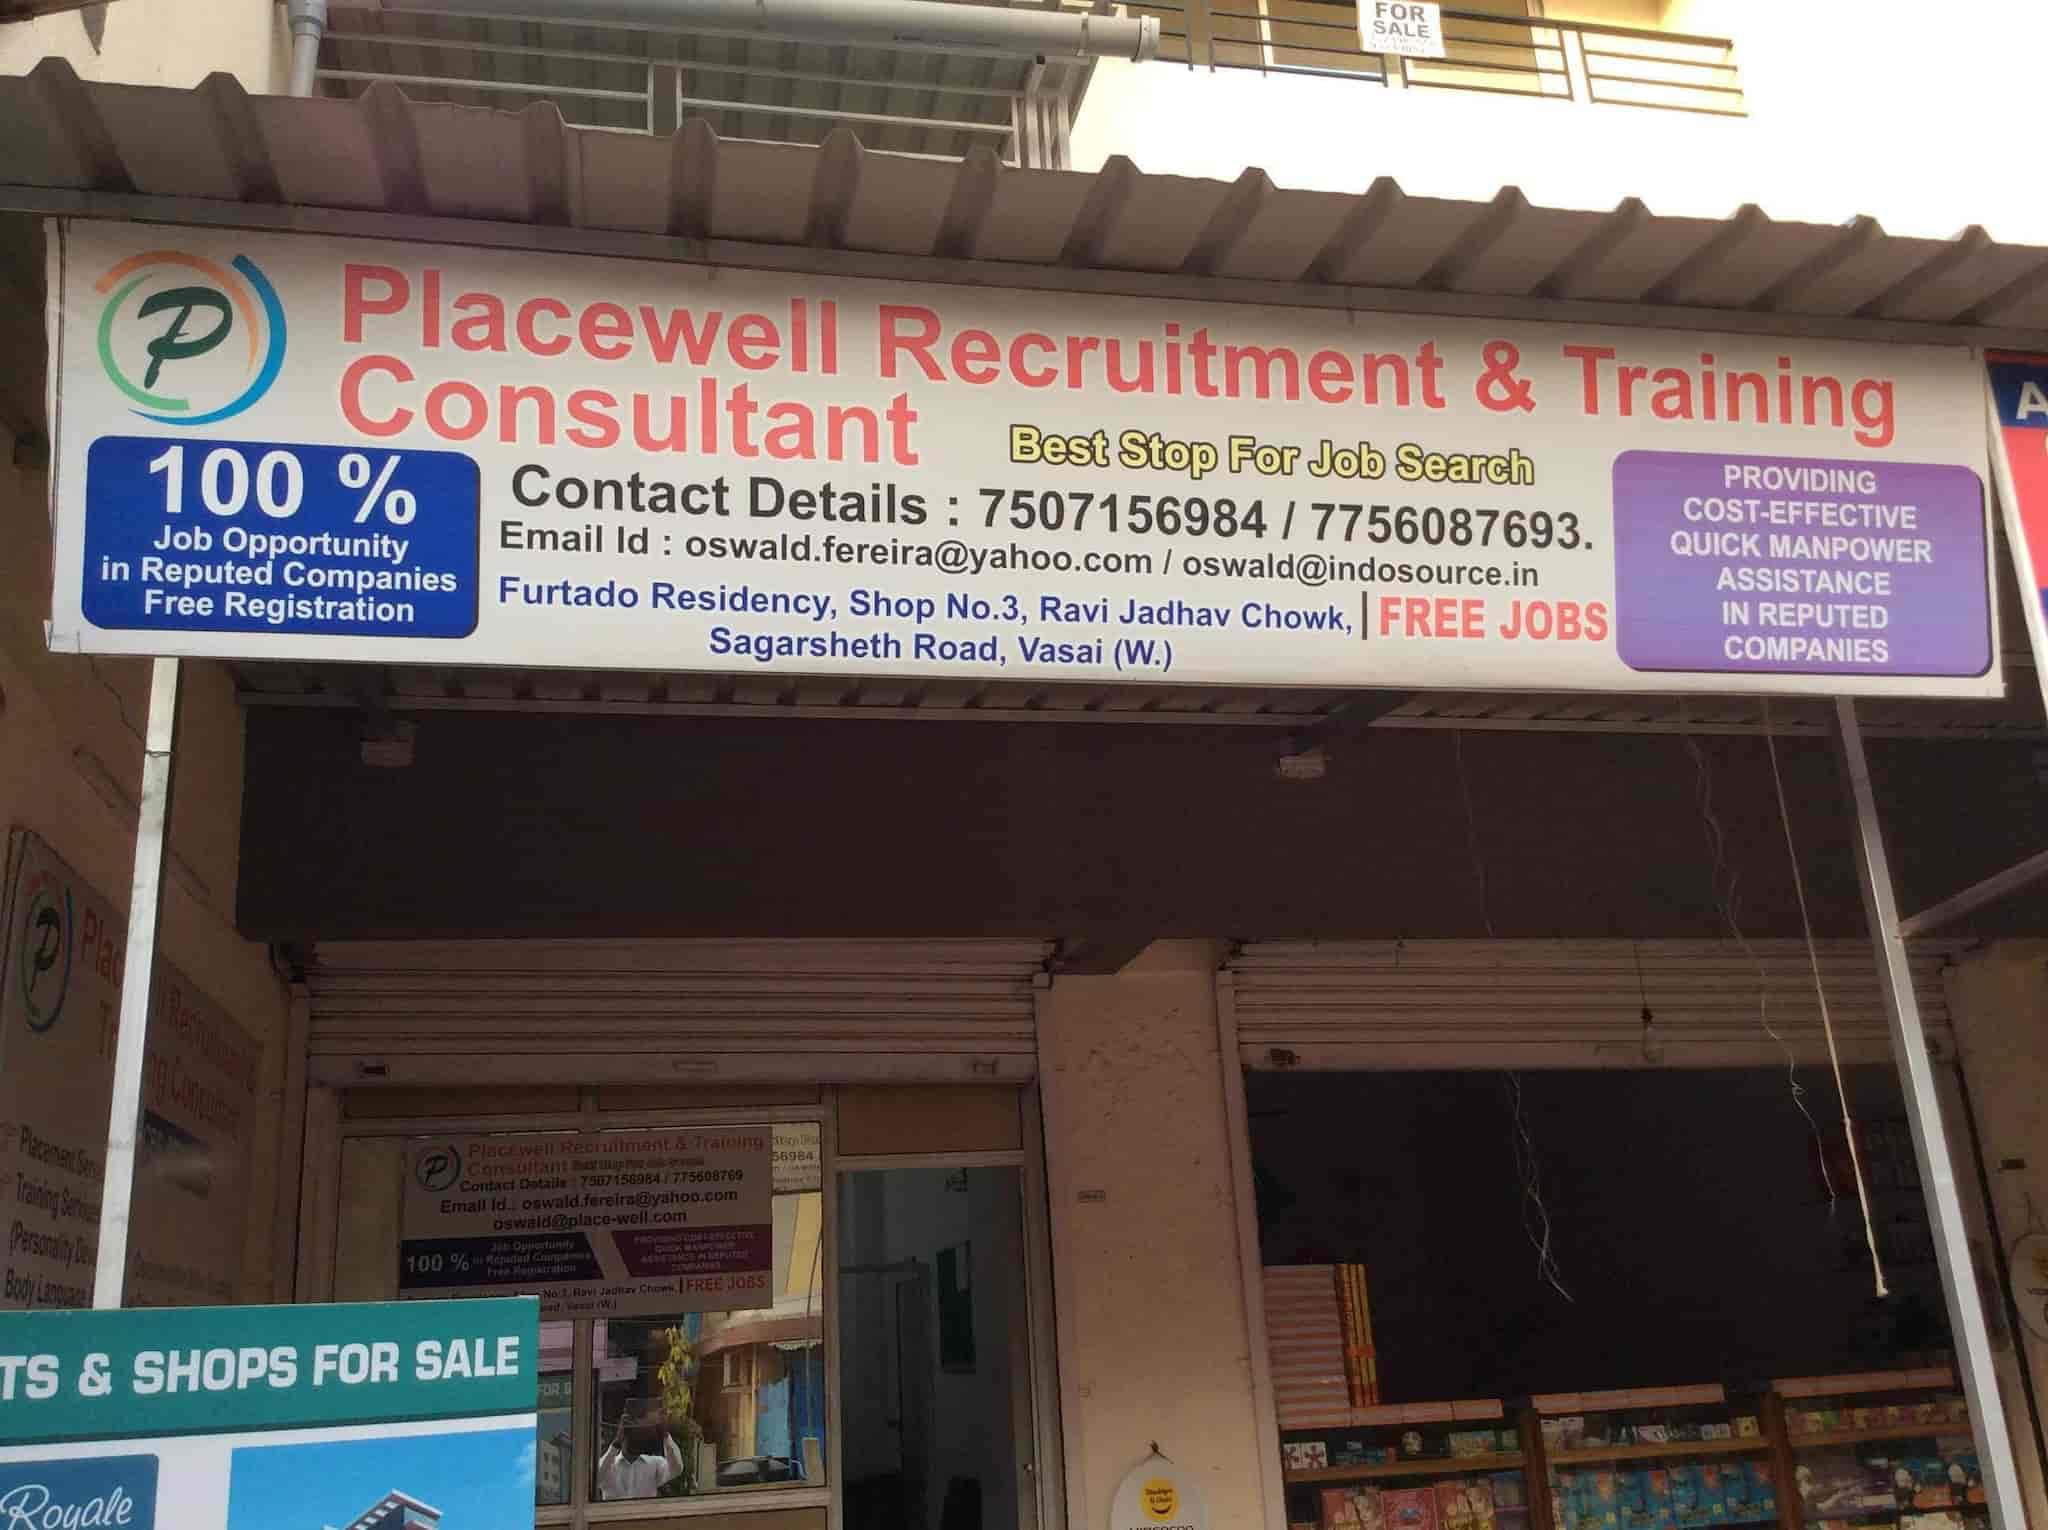 Placewell Recruitment Training Consultant, Vasai Road West